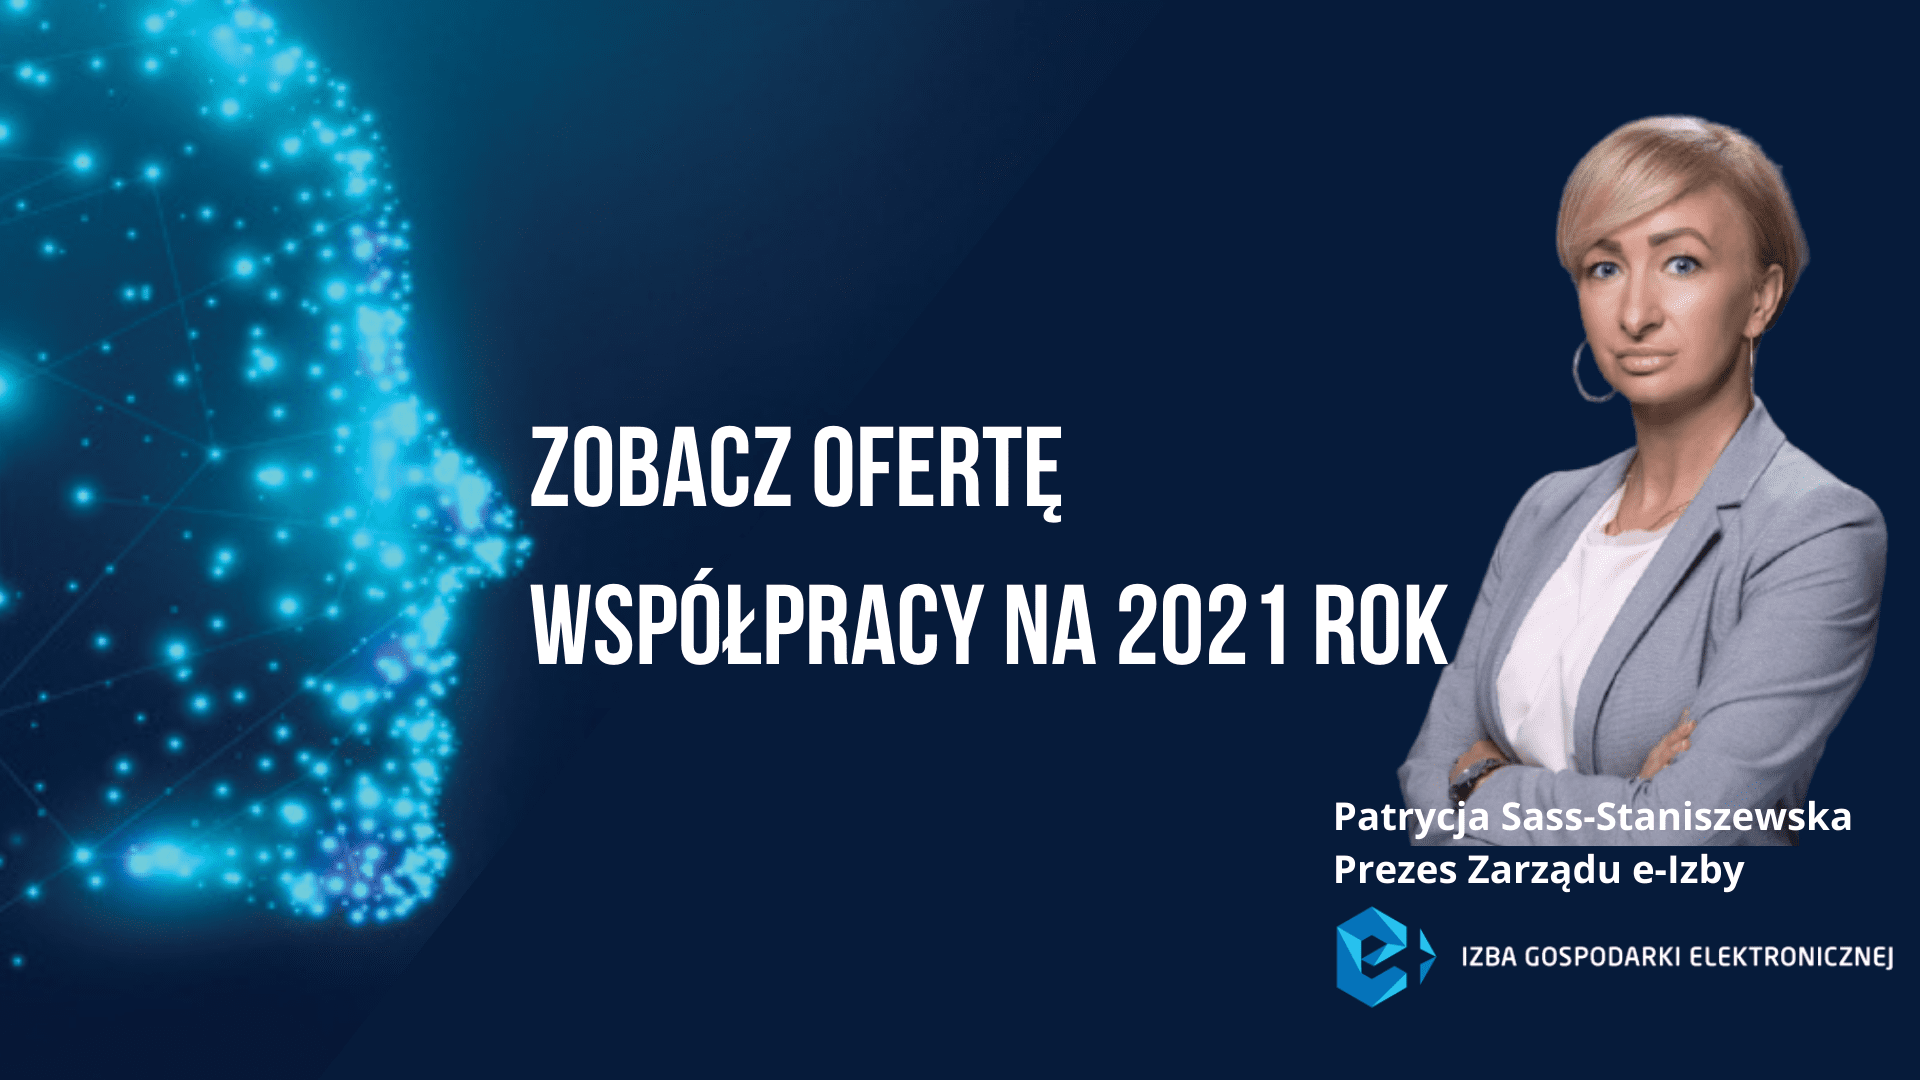 Oferta współpracy z e-Izbą na 2021 rok